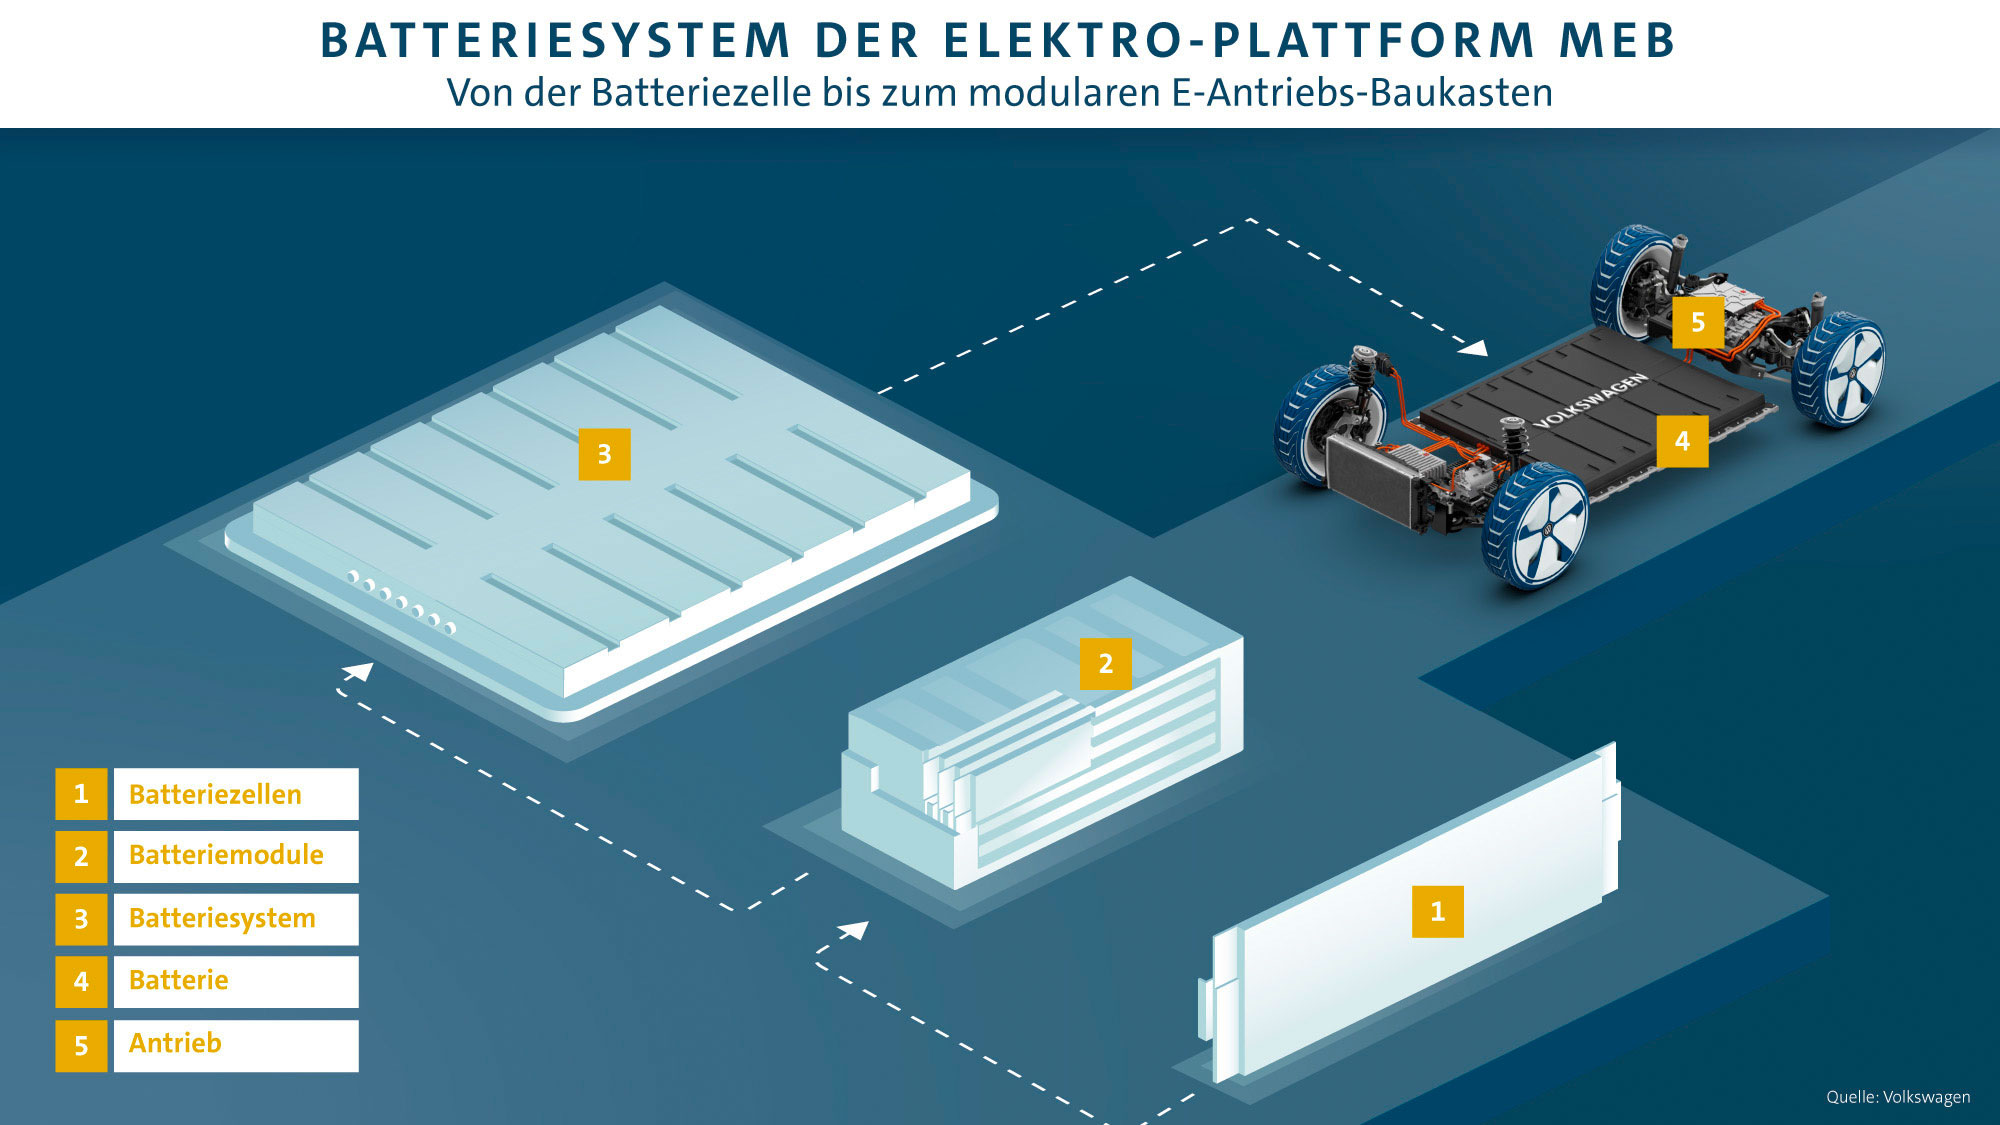 VW-MEB-Batterie-Aufbau